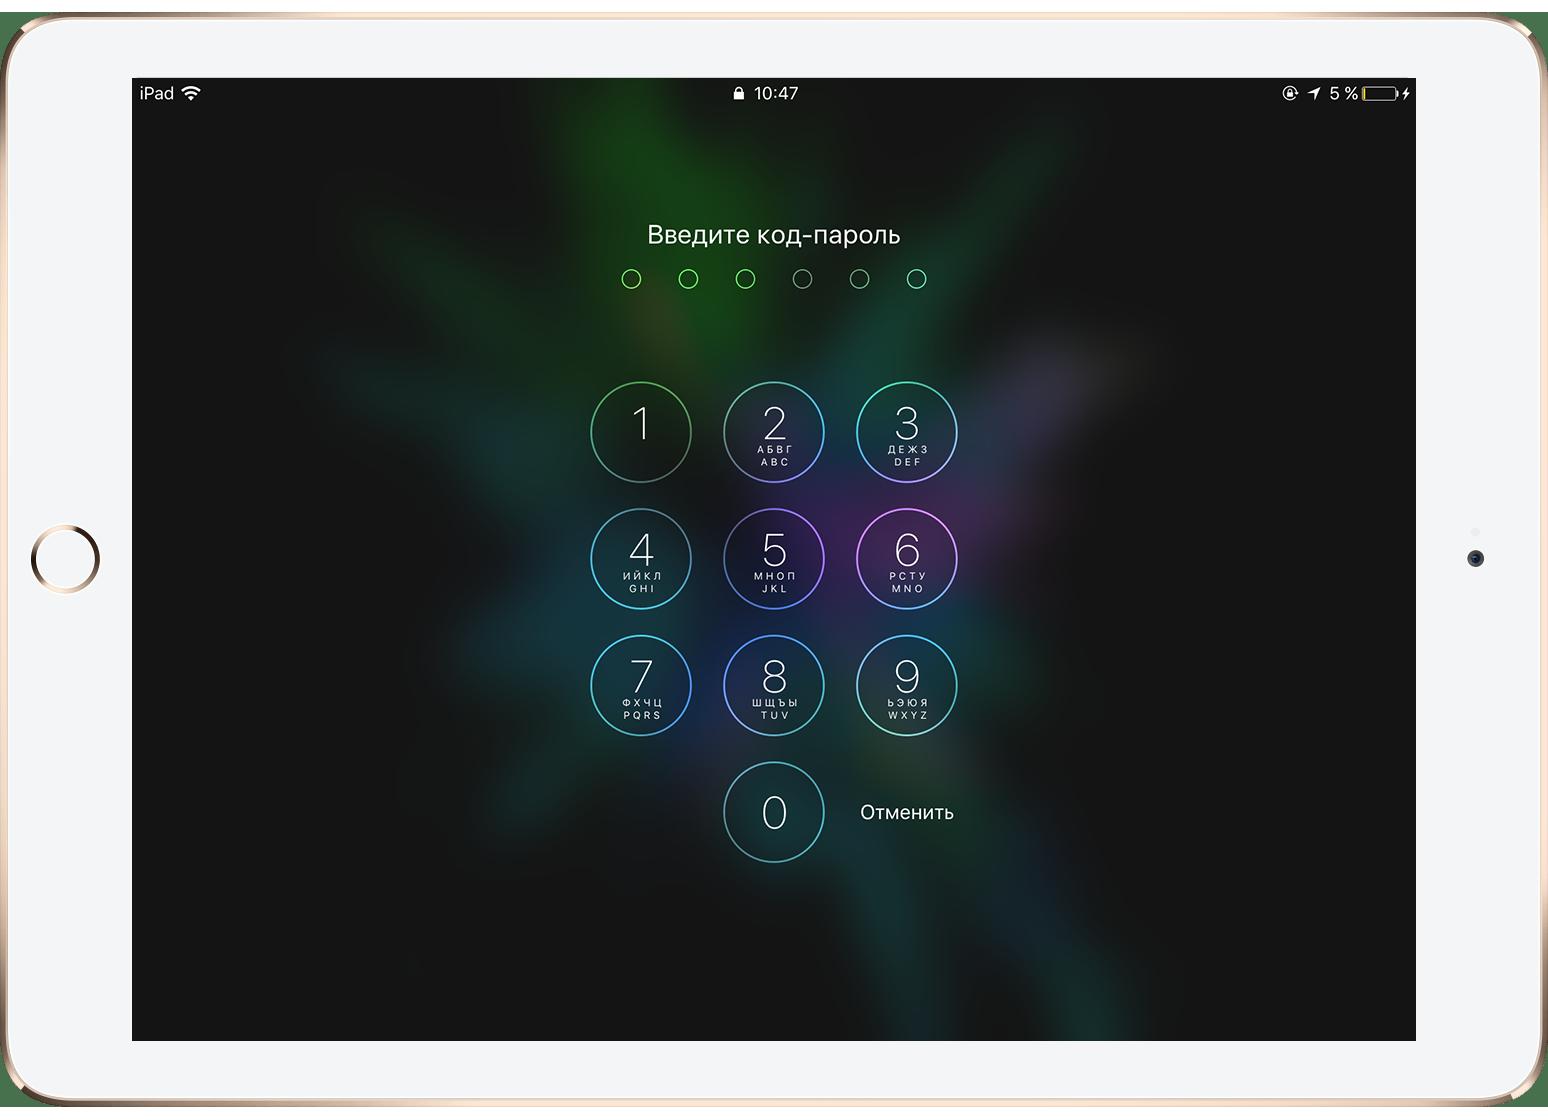 Украли iPhone или iPad? Заблокируйте устройство (инструкция)